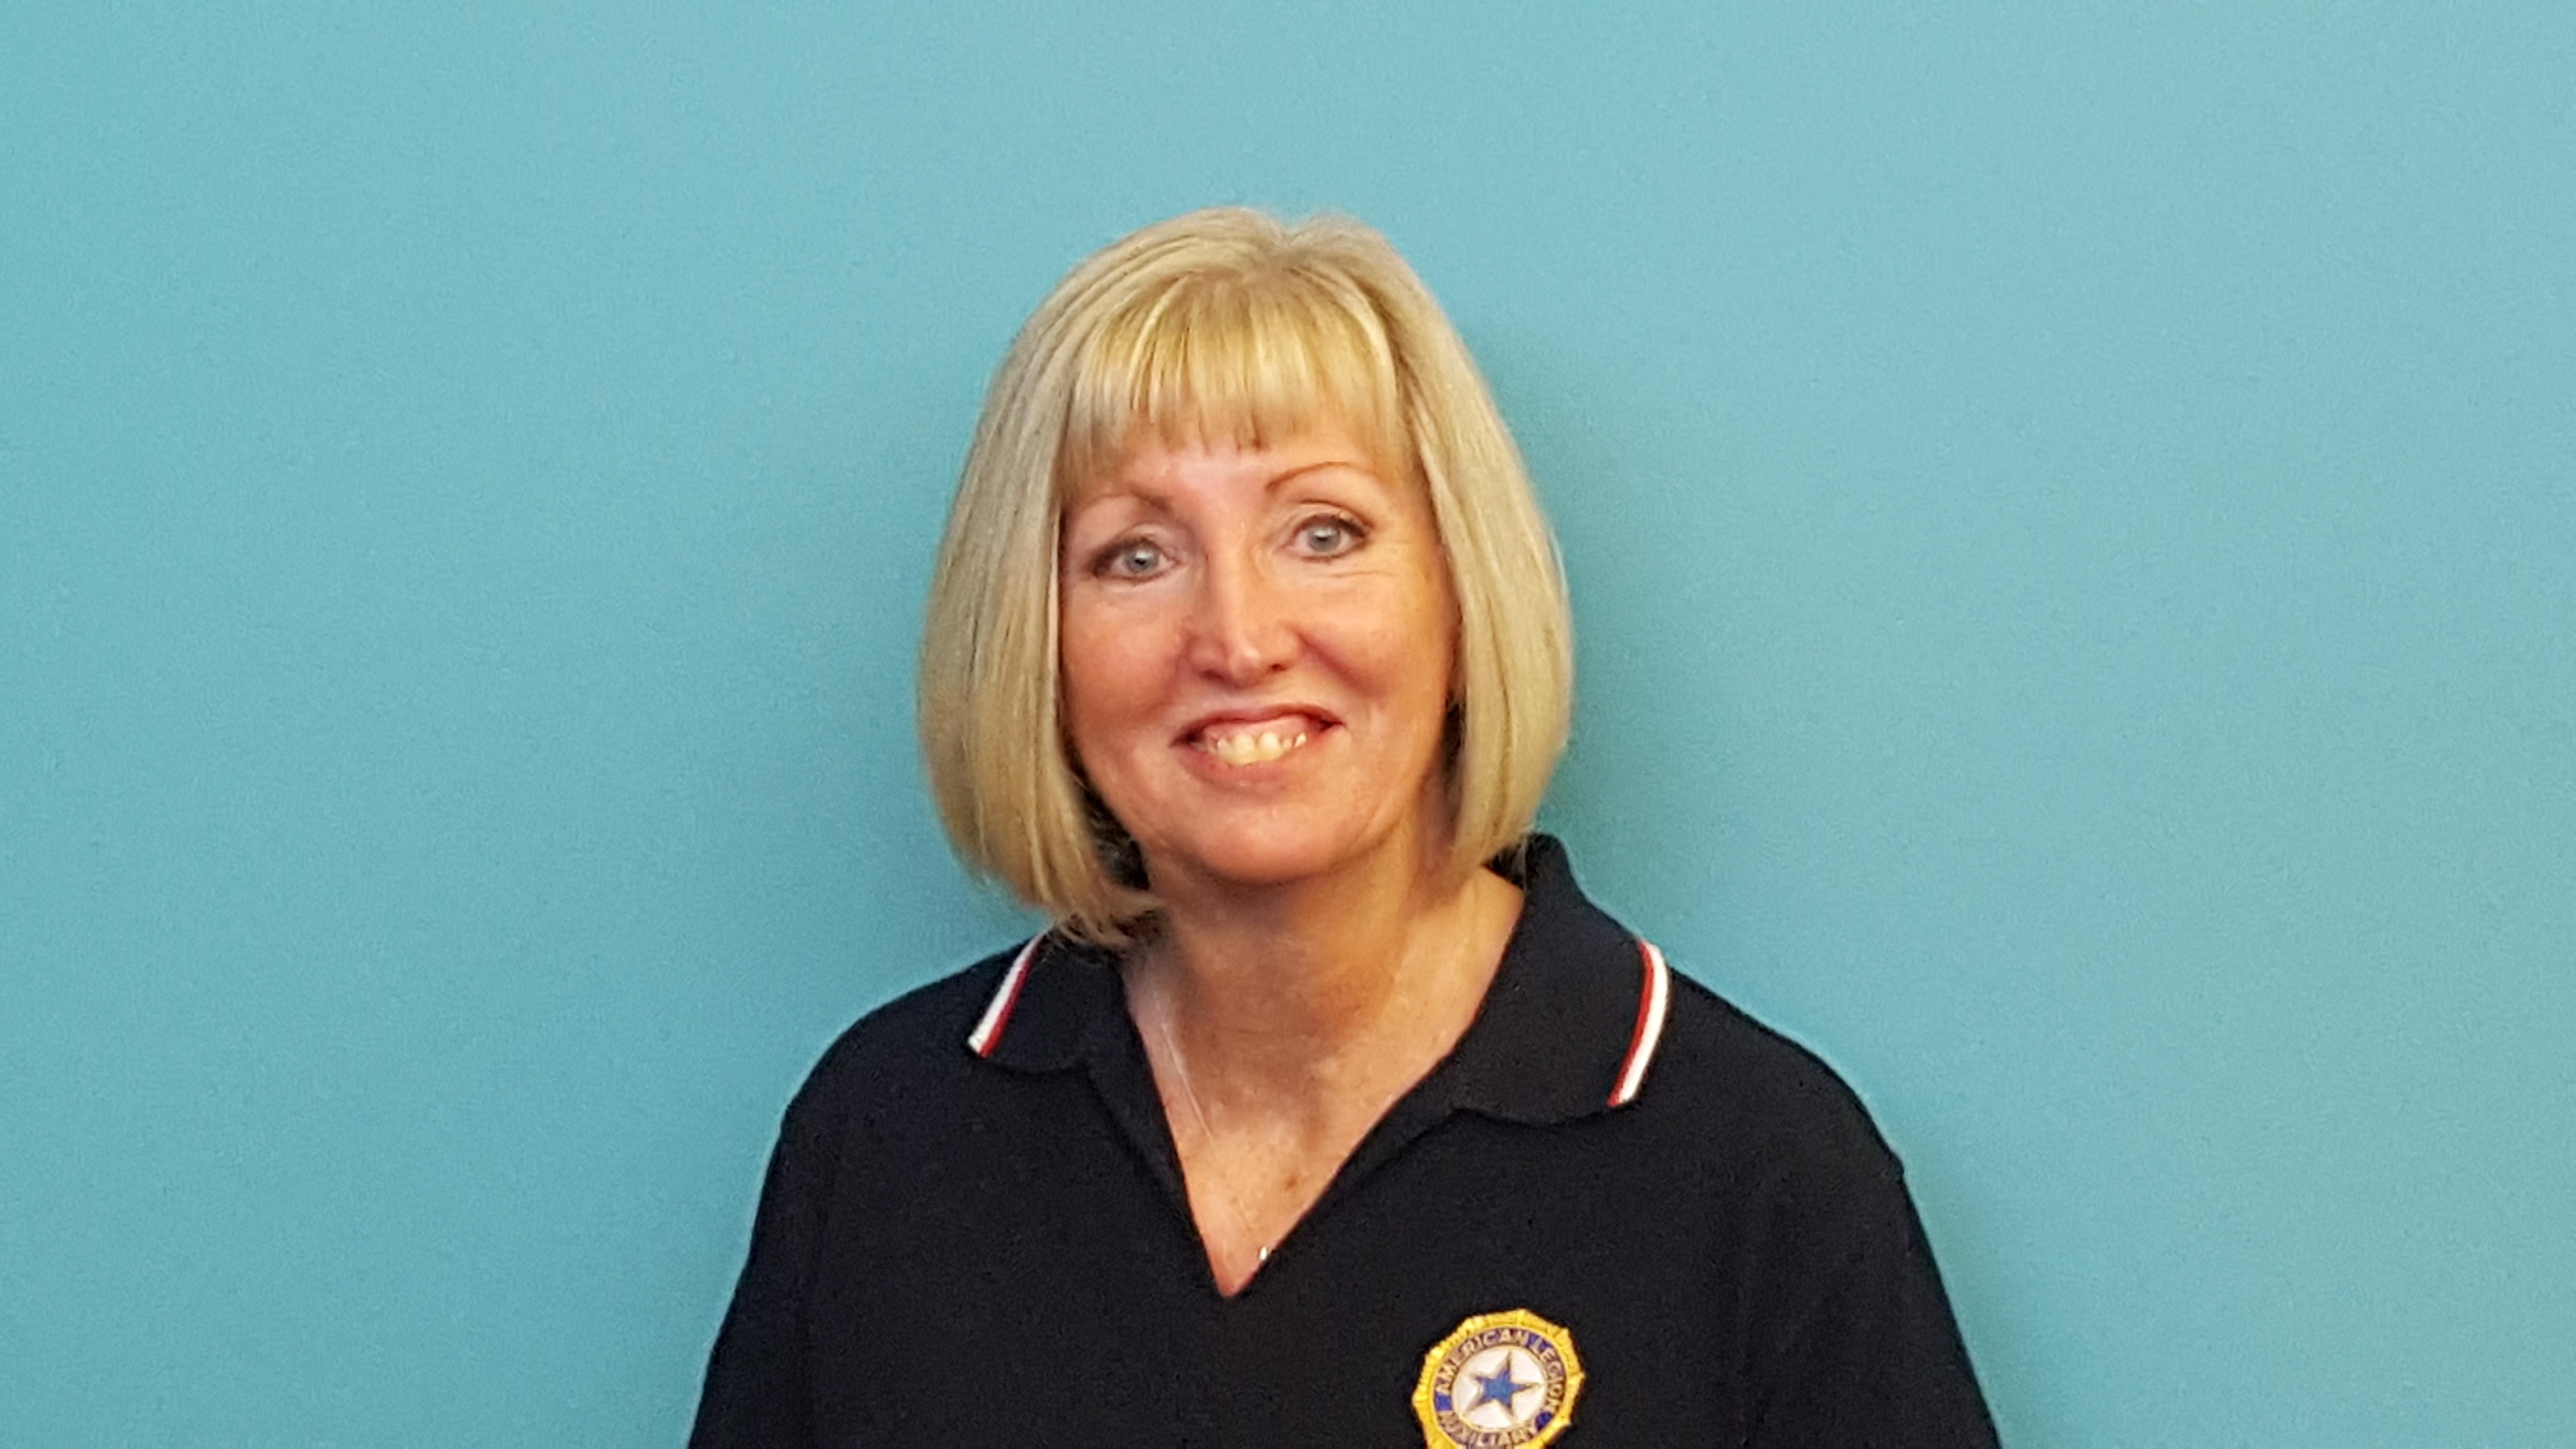 Image of Paula Brotherton